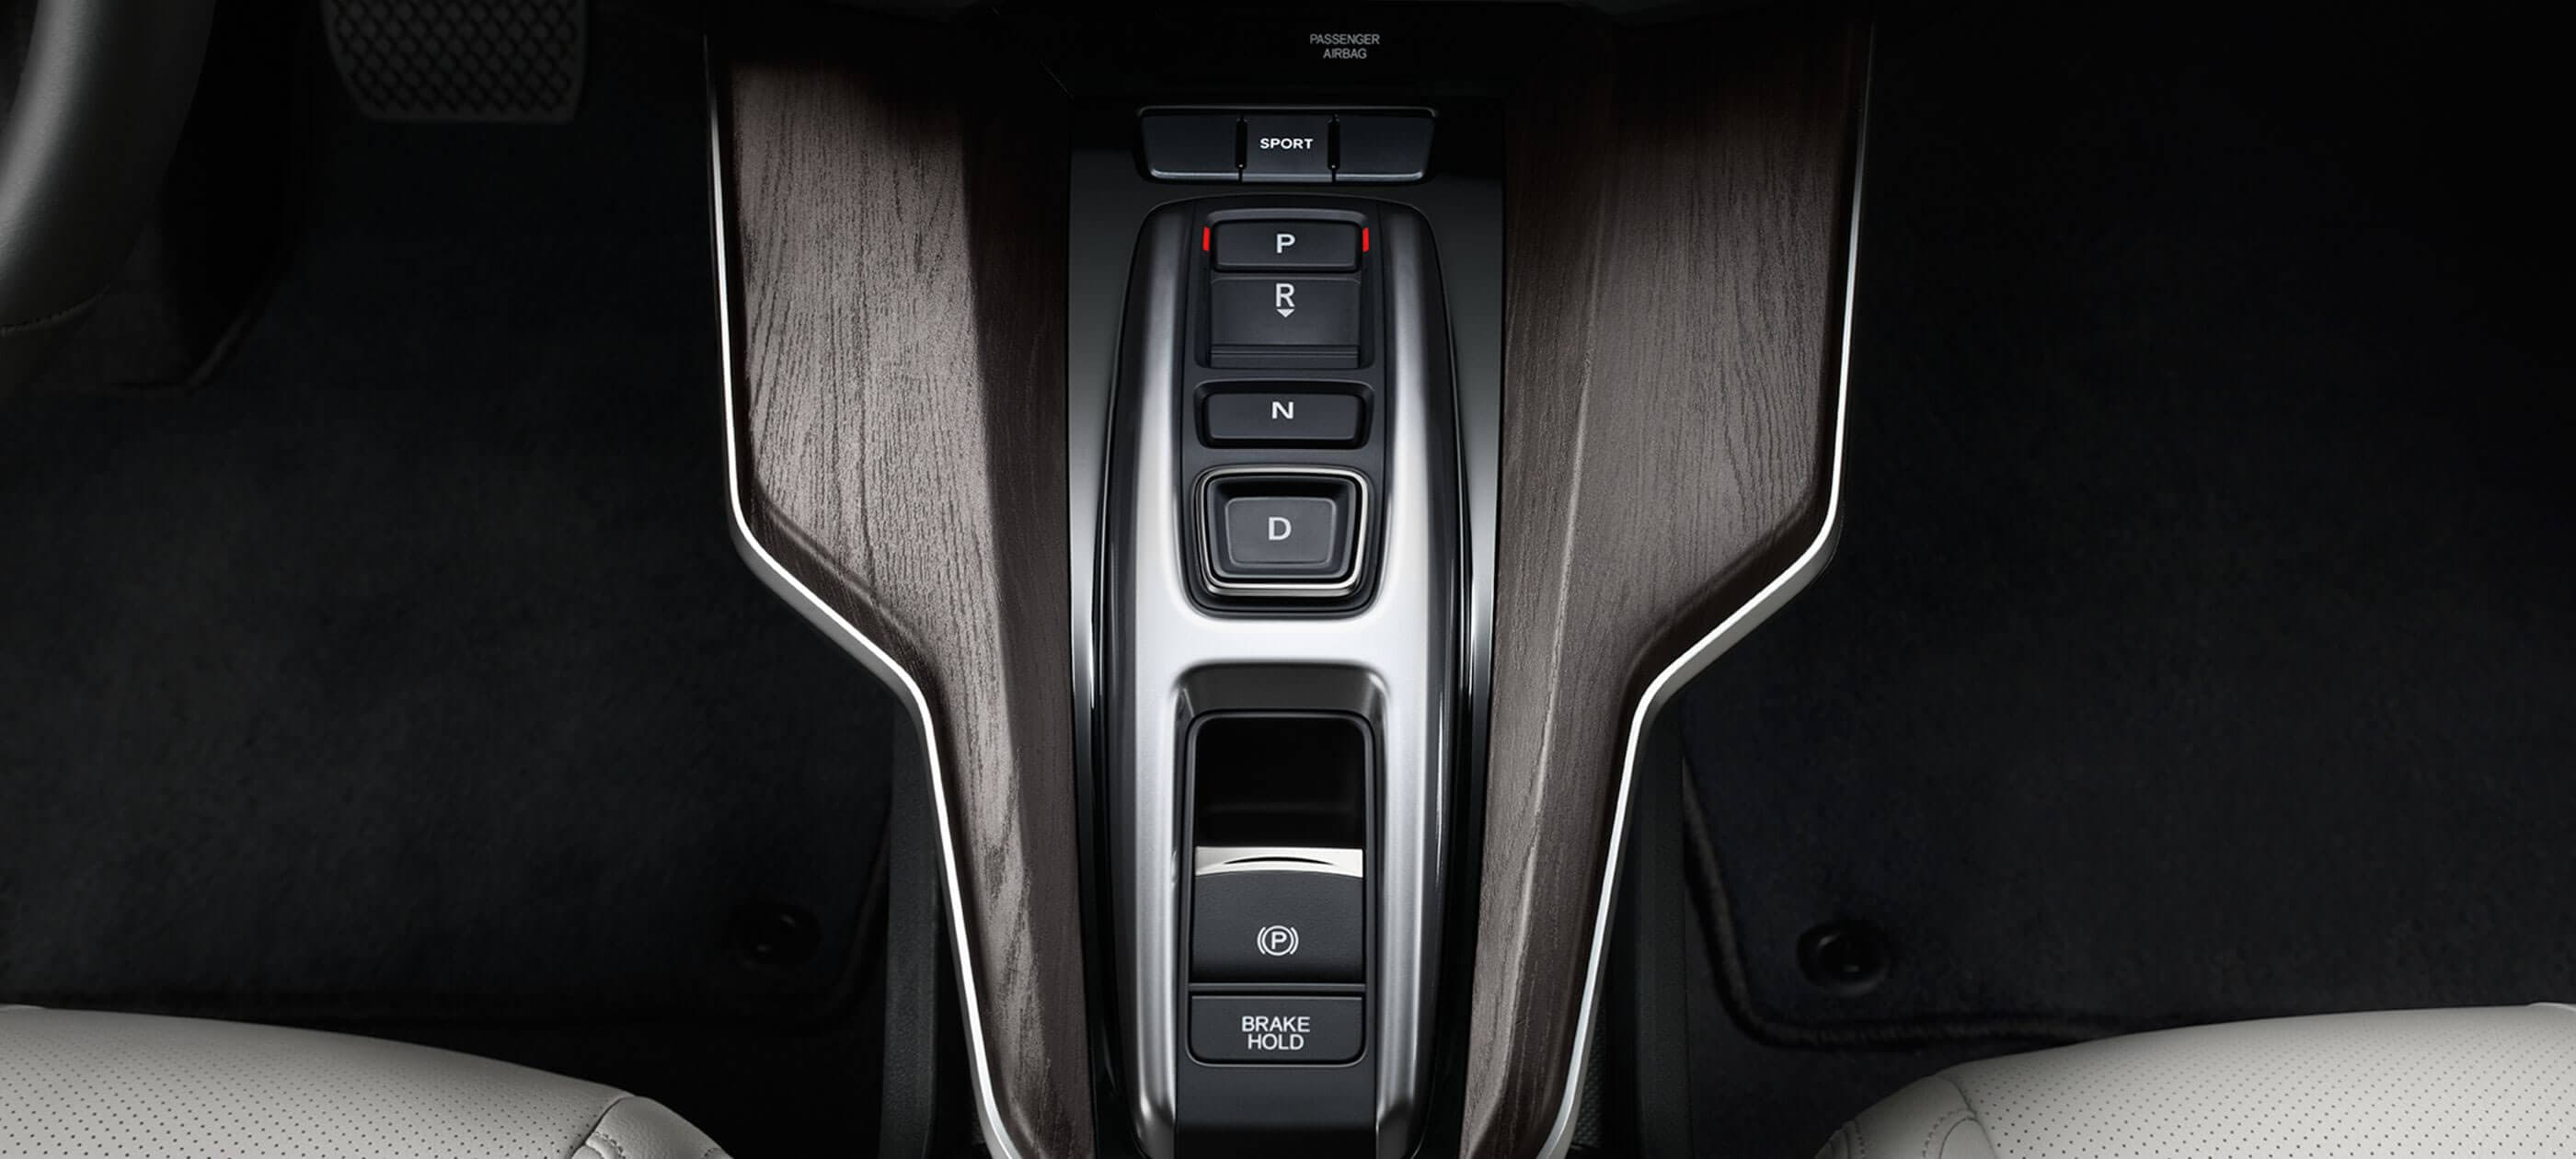 Driver-Centered Design